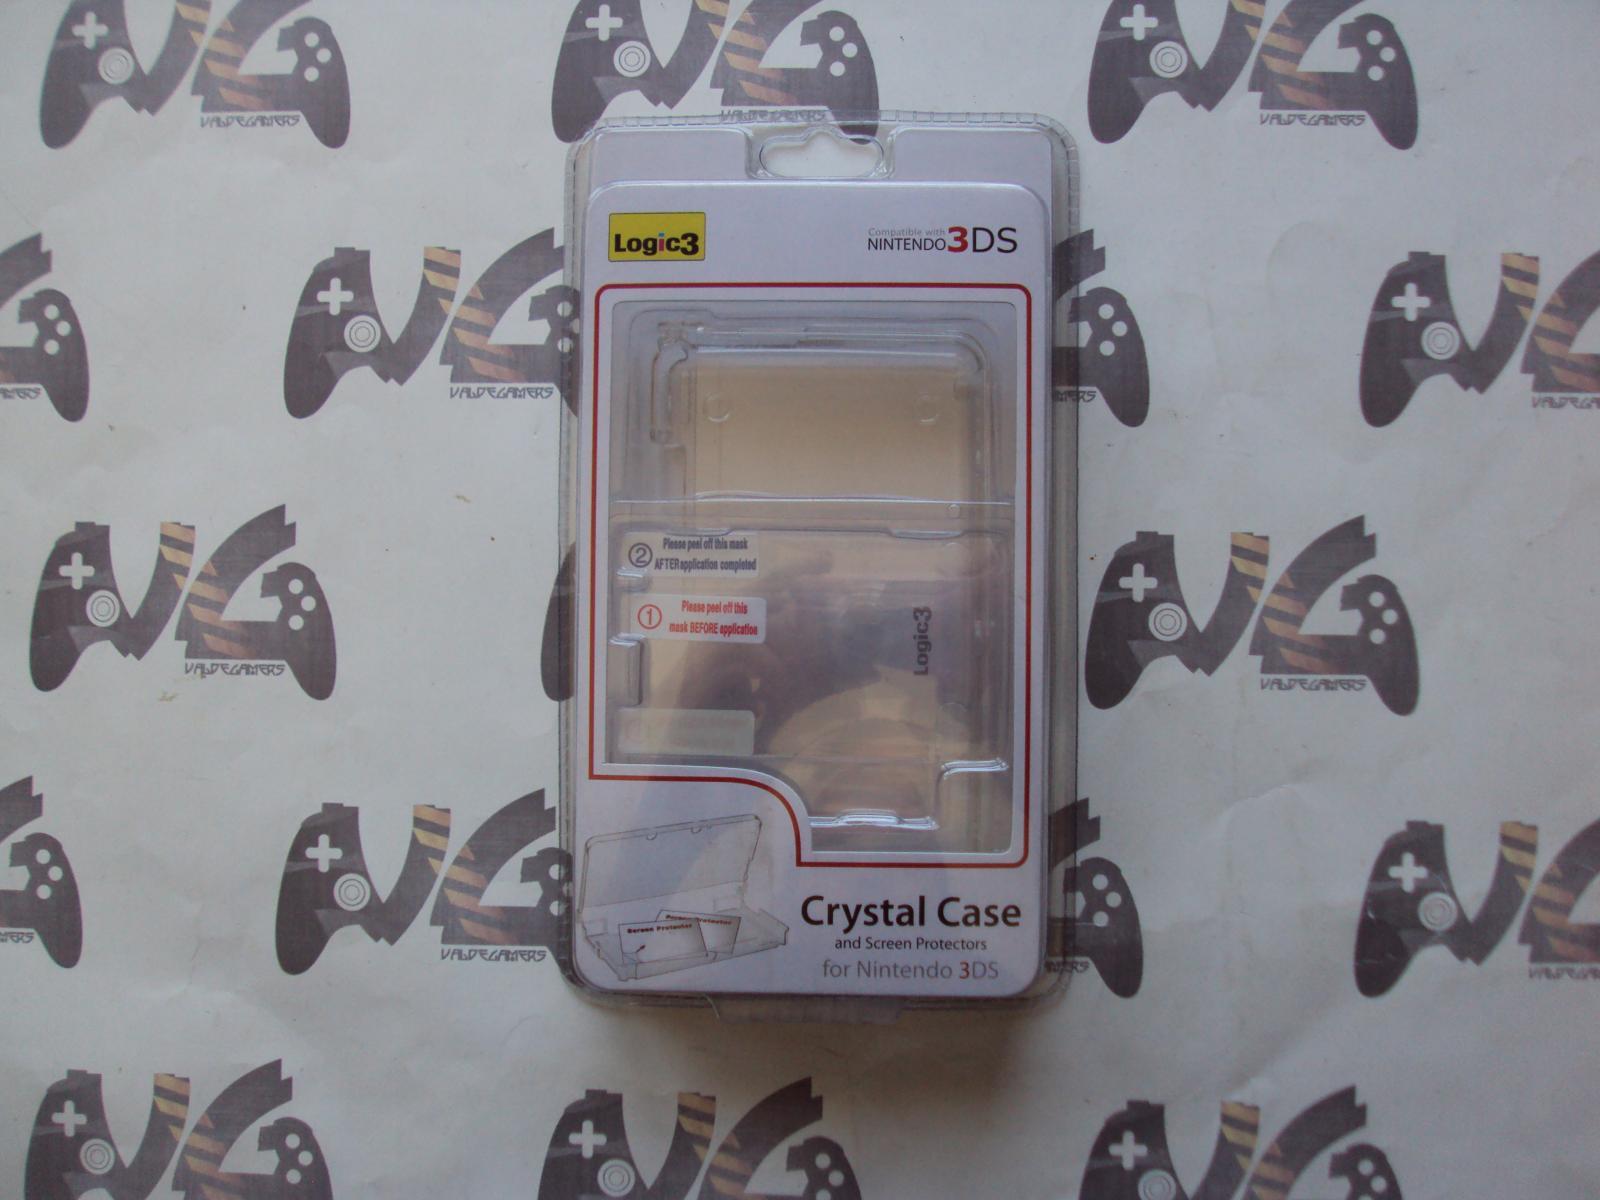 protector de carcasa crystal + laminas protectores de pantallas